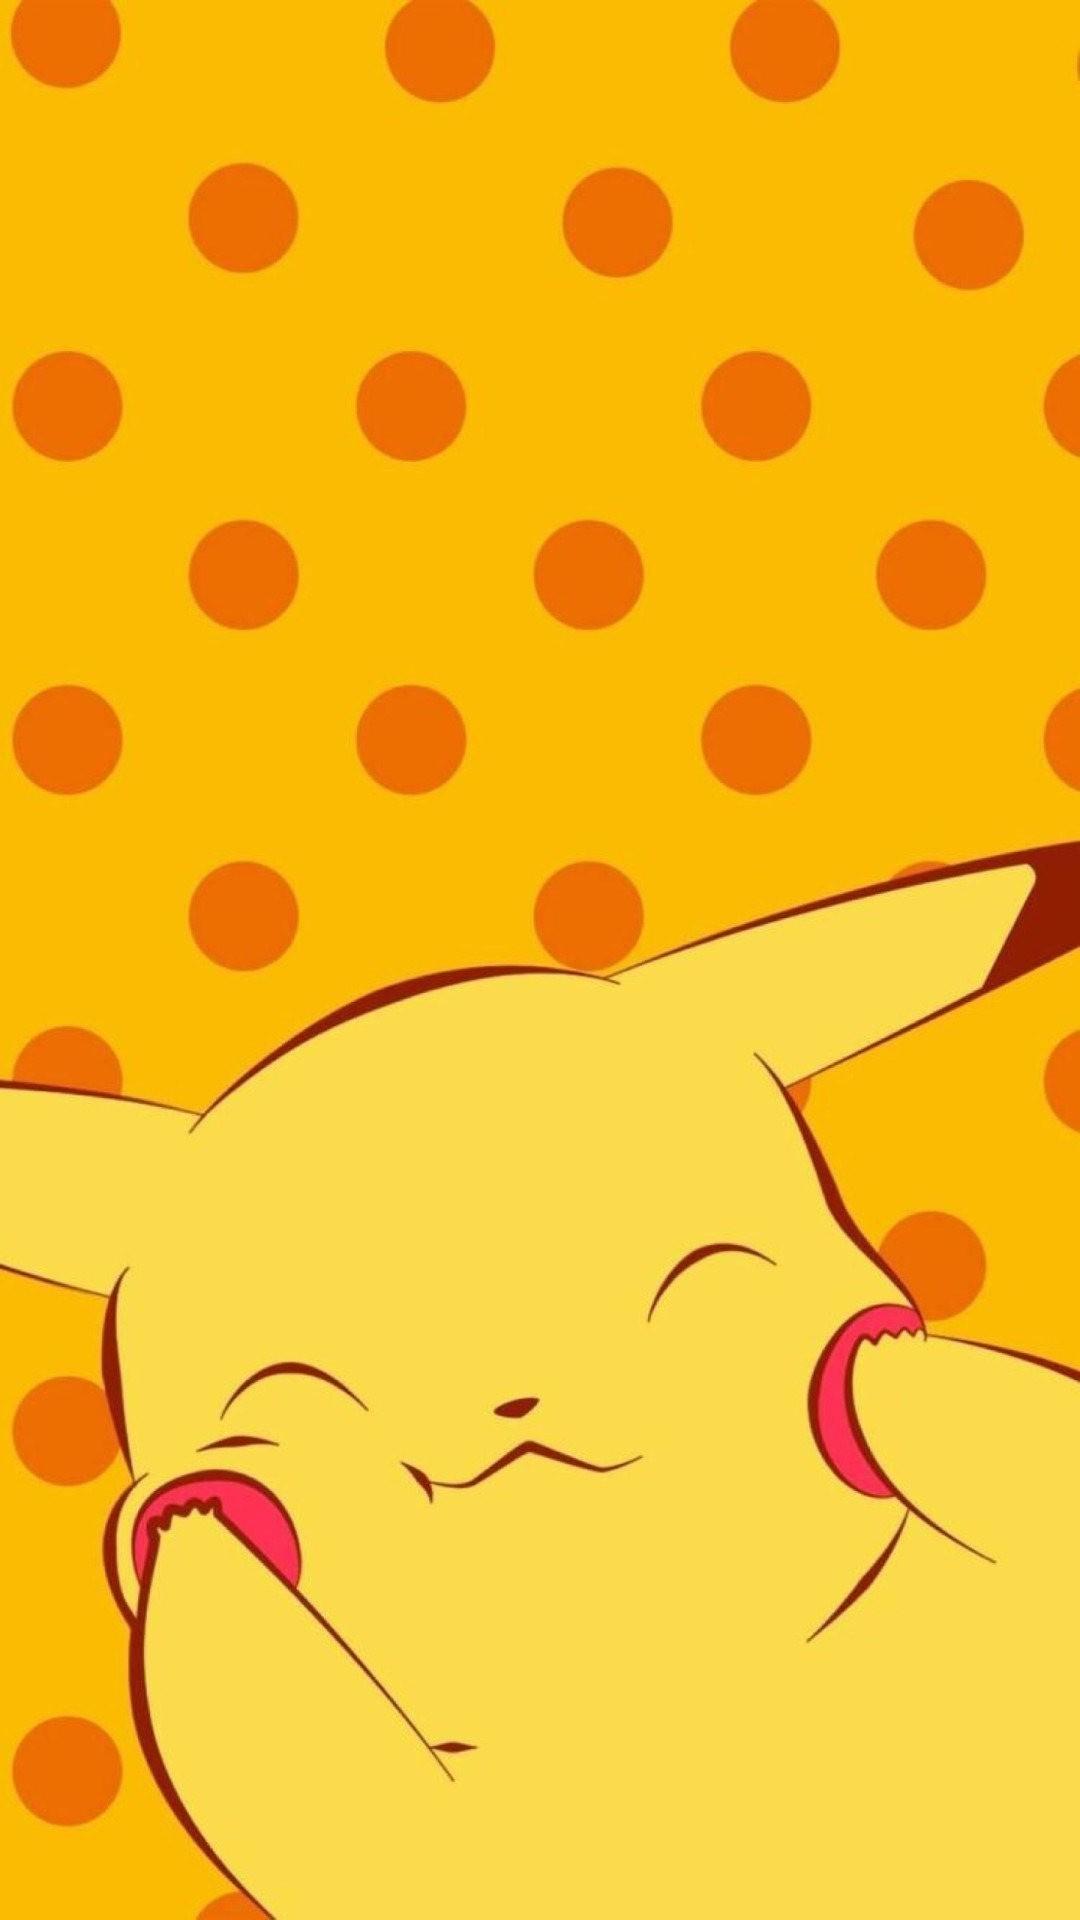 Cute Pikachu Wallpaper Kolpaper Awesome Free Hd Wallpapers